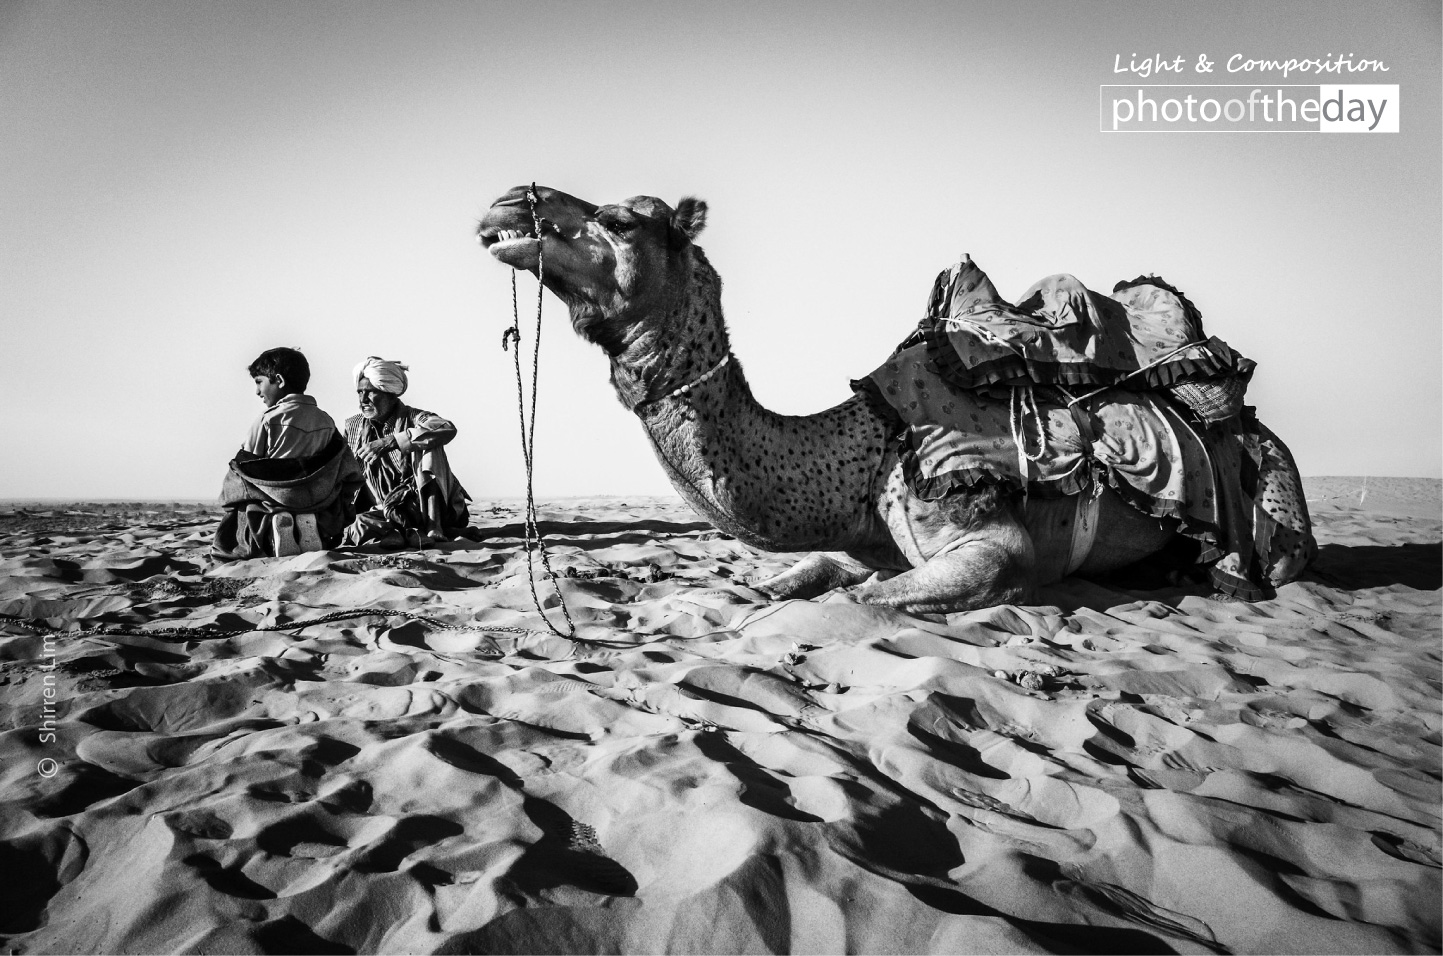 A Man, a Boy, and a Camel by Shirren Lim